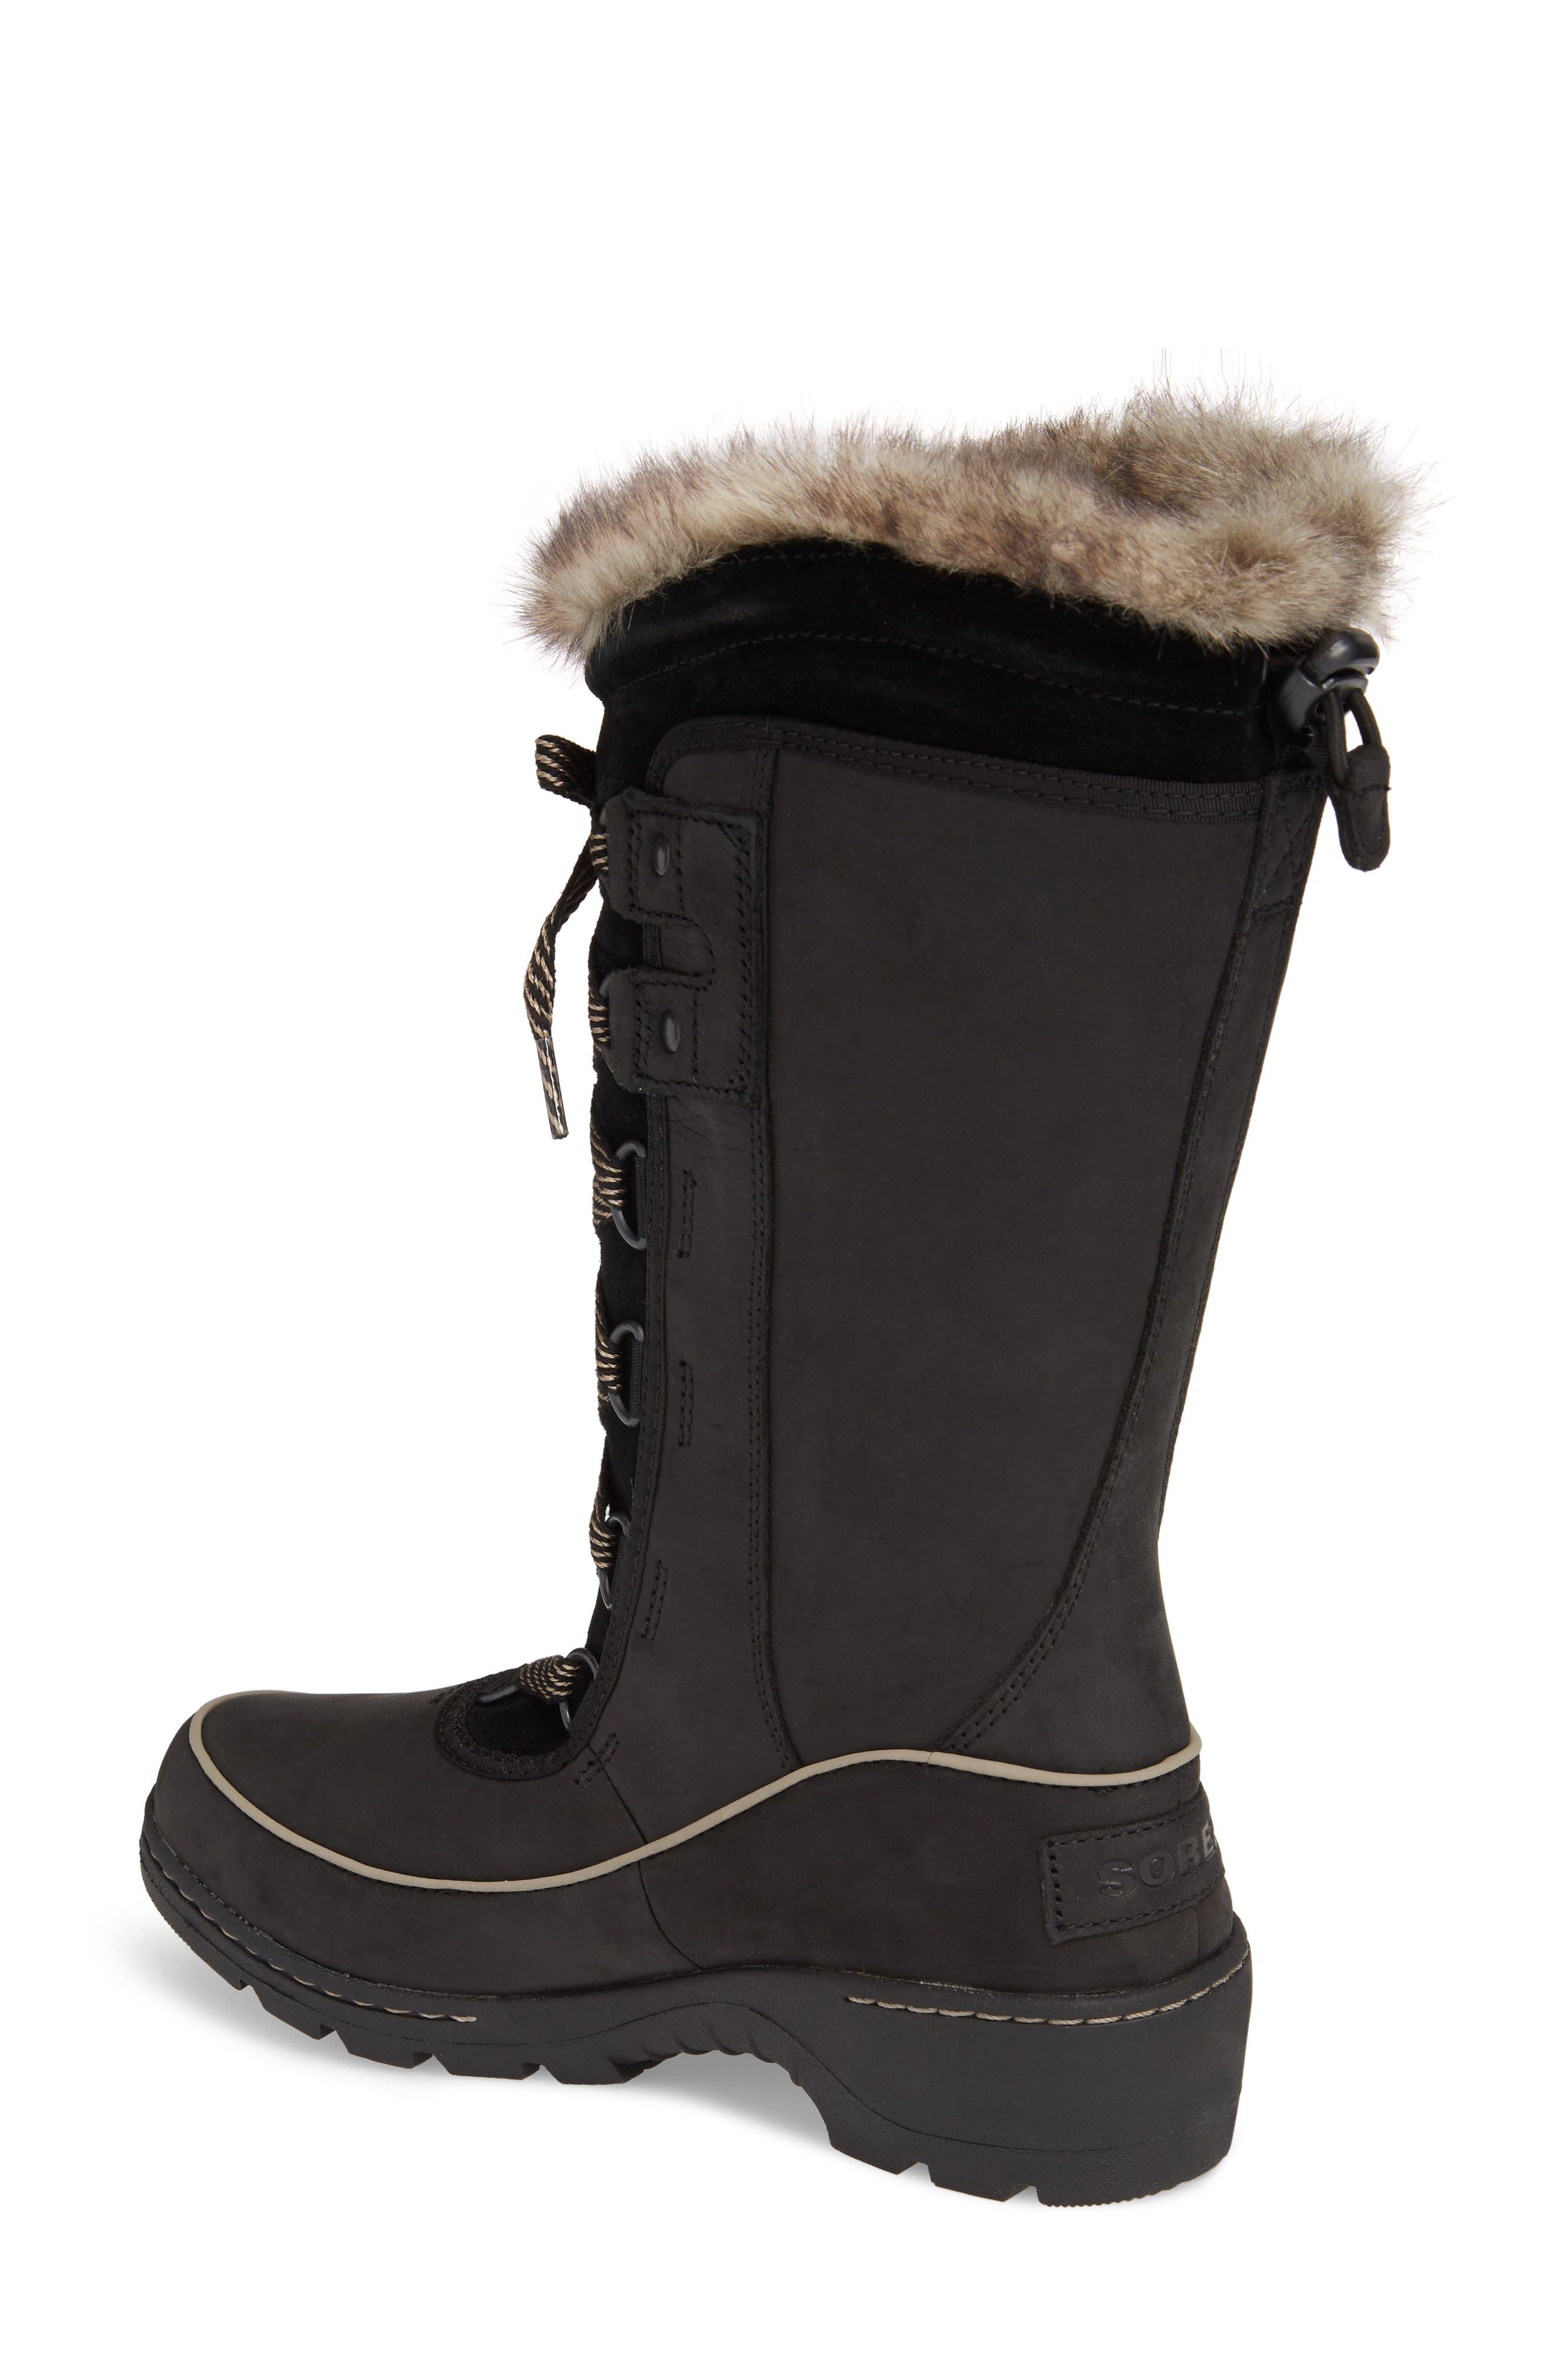 SOREL Tivoli Ii Insulated Winter Boot With Faux Fur Trim